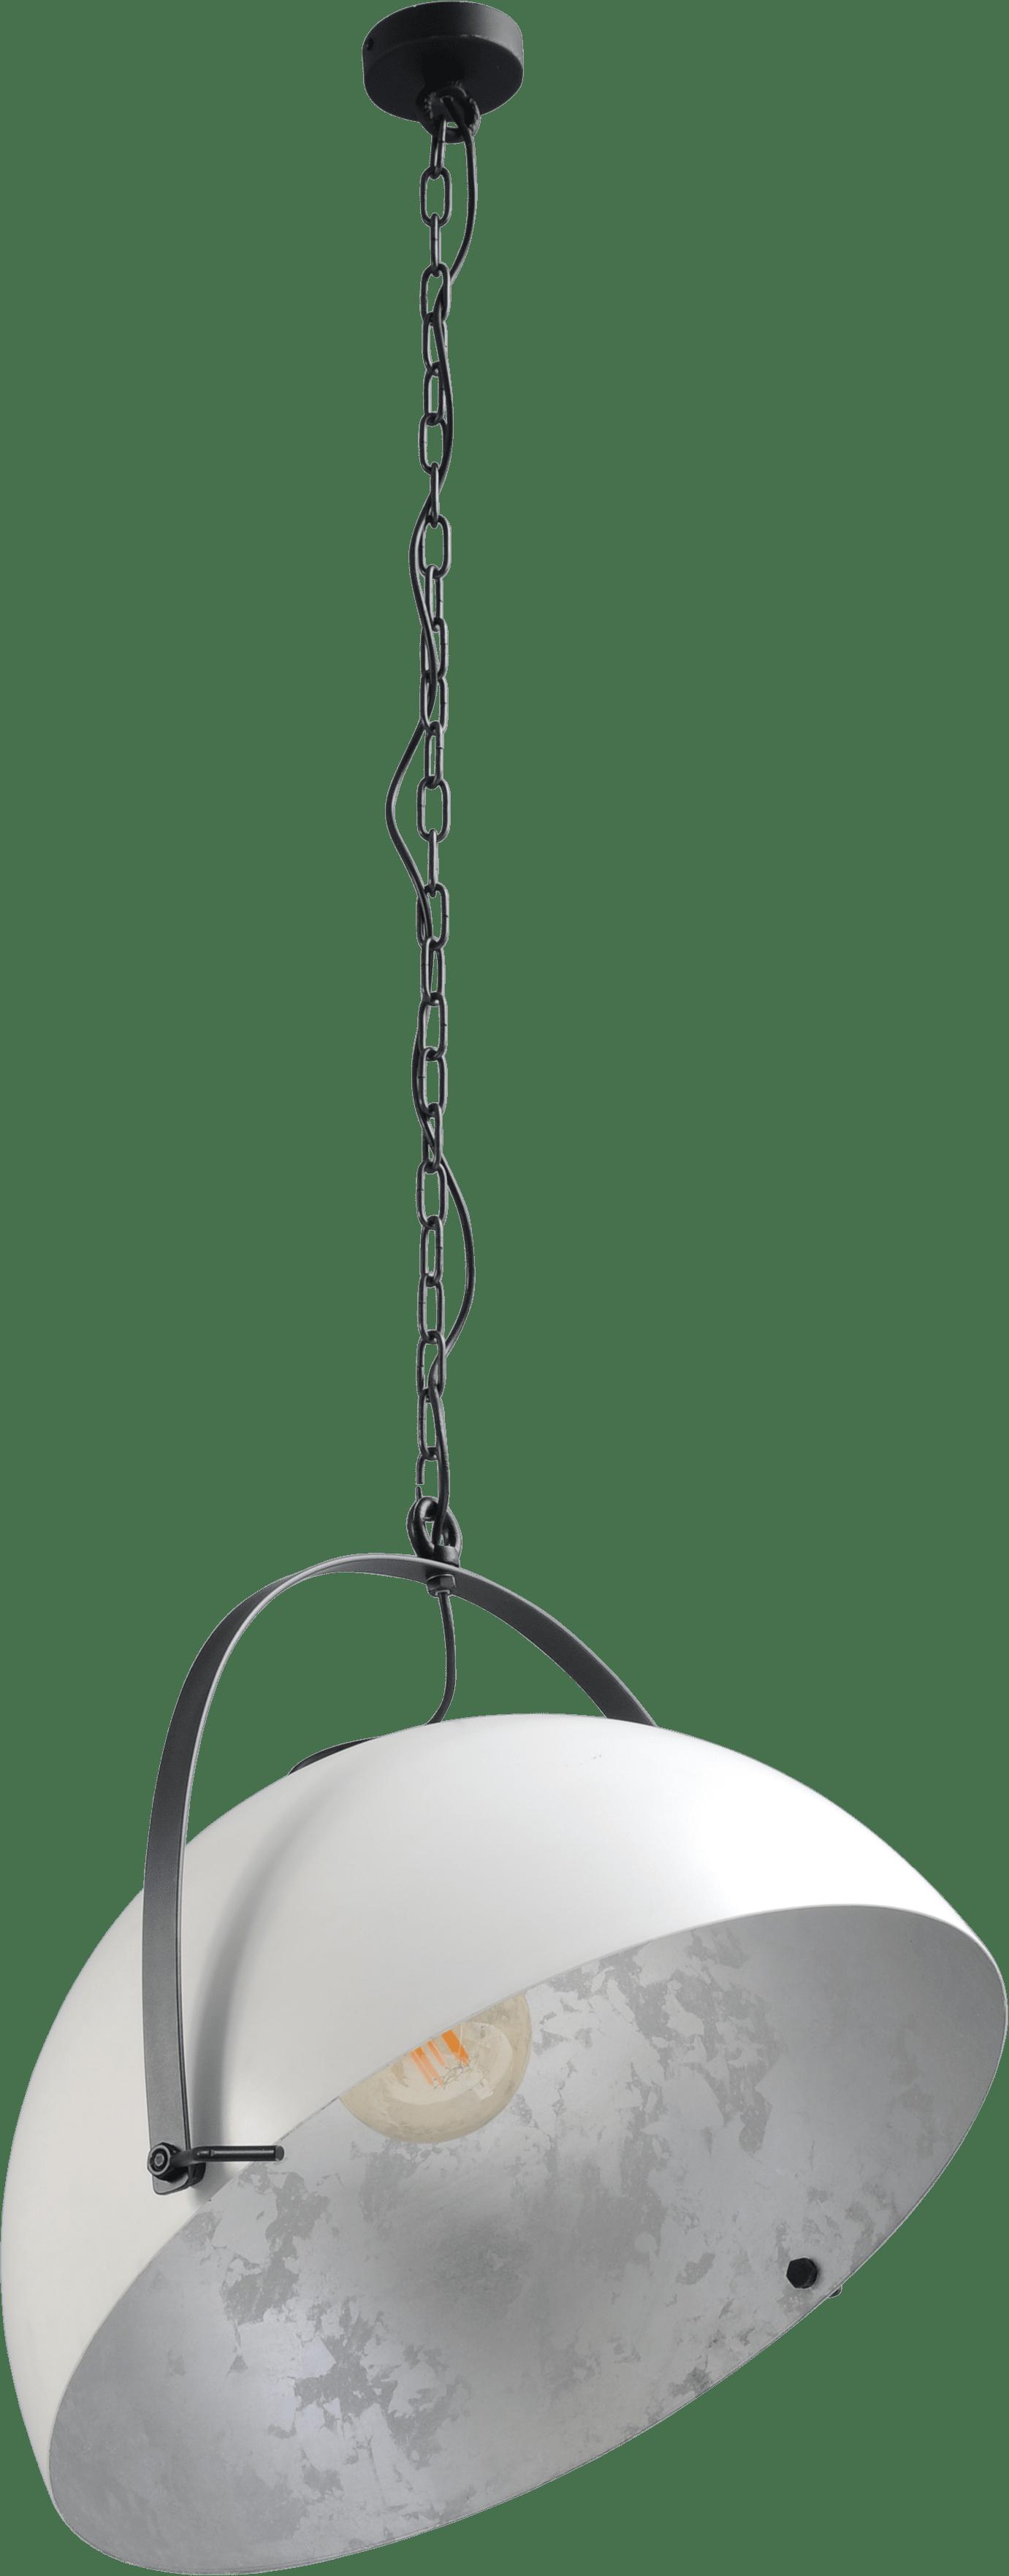 Larino Bow HL LARINO BOW D.60CM WHITE EXTERIOR